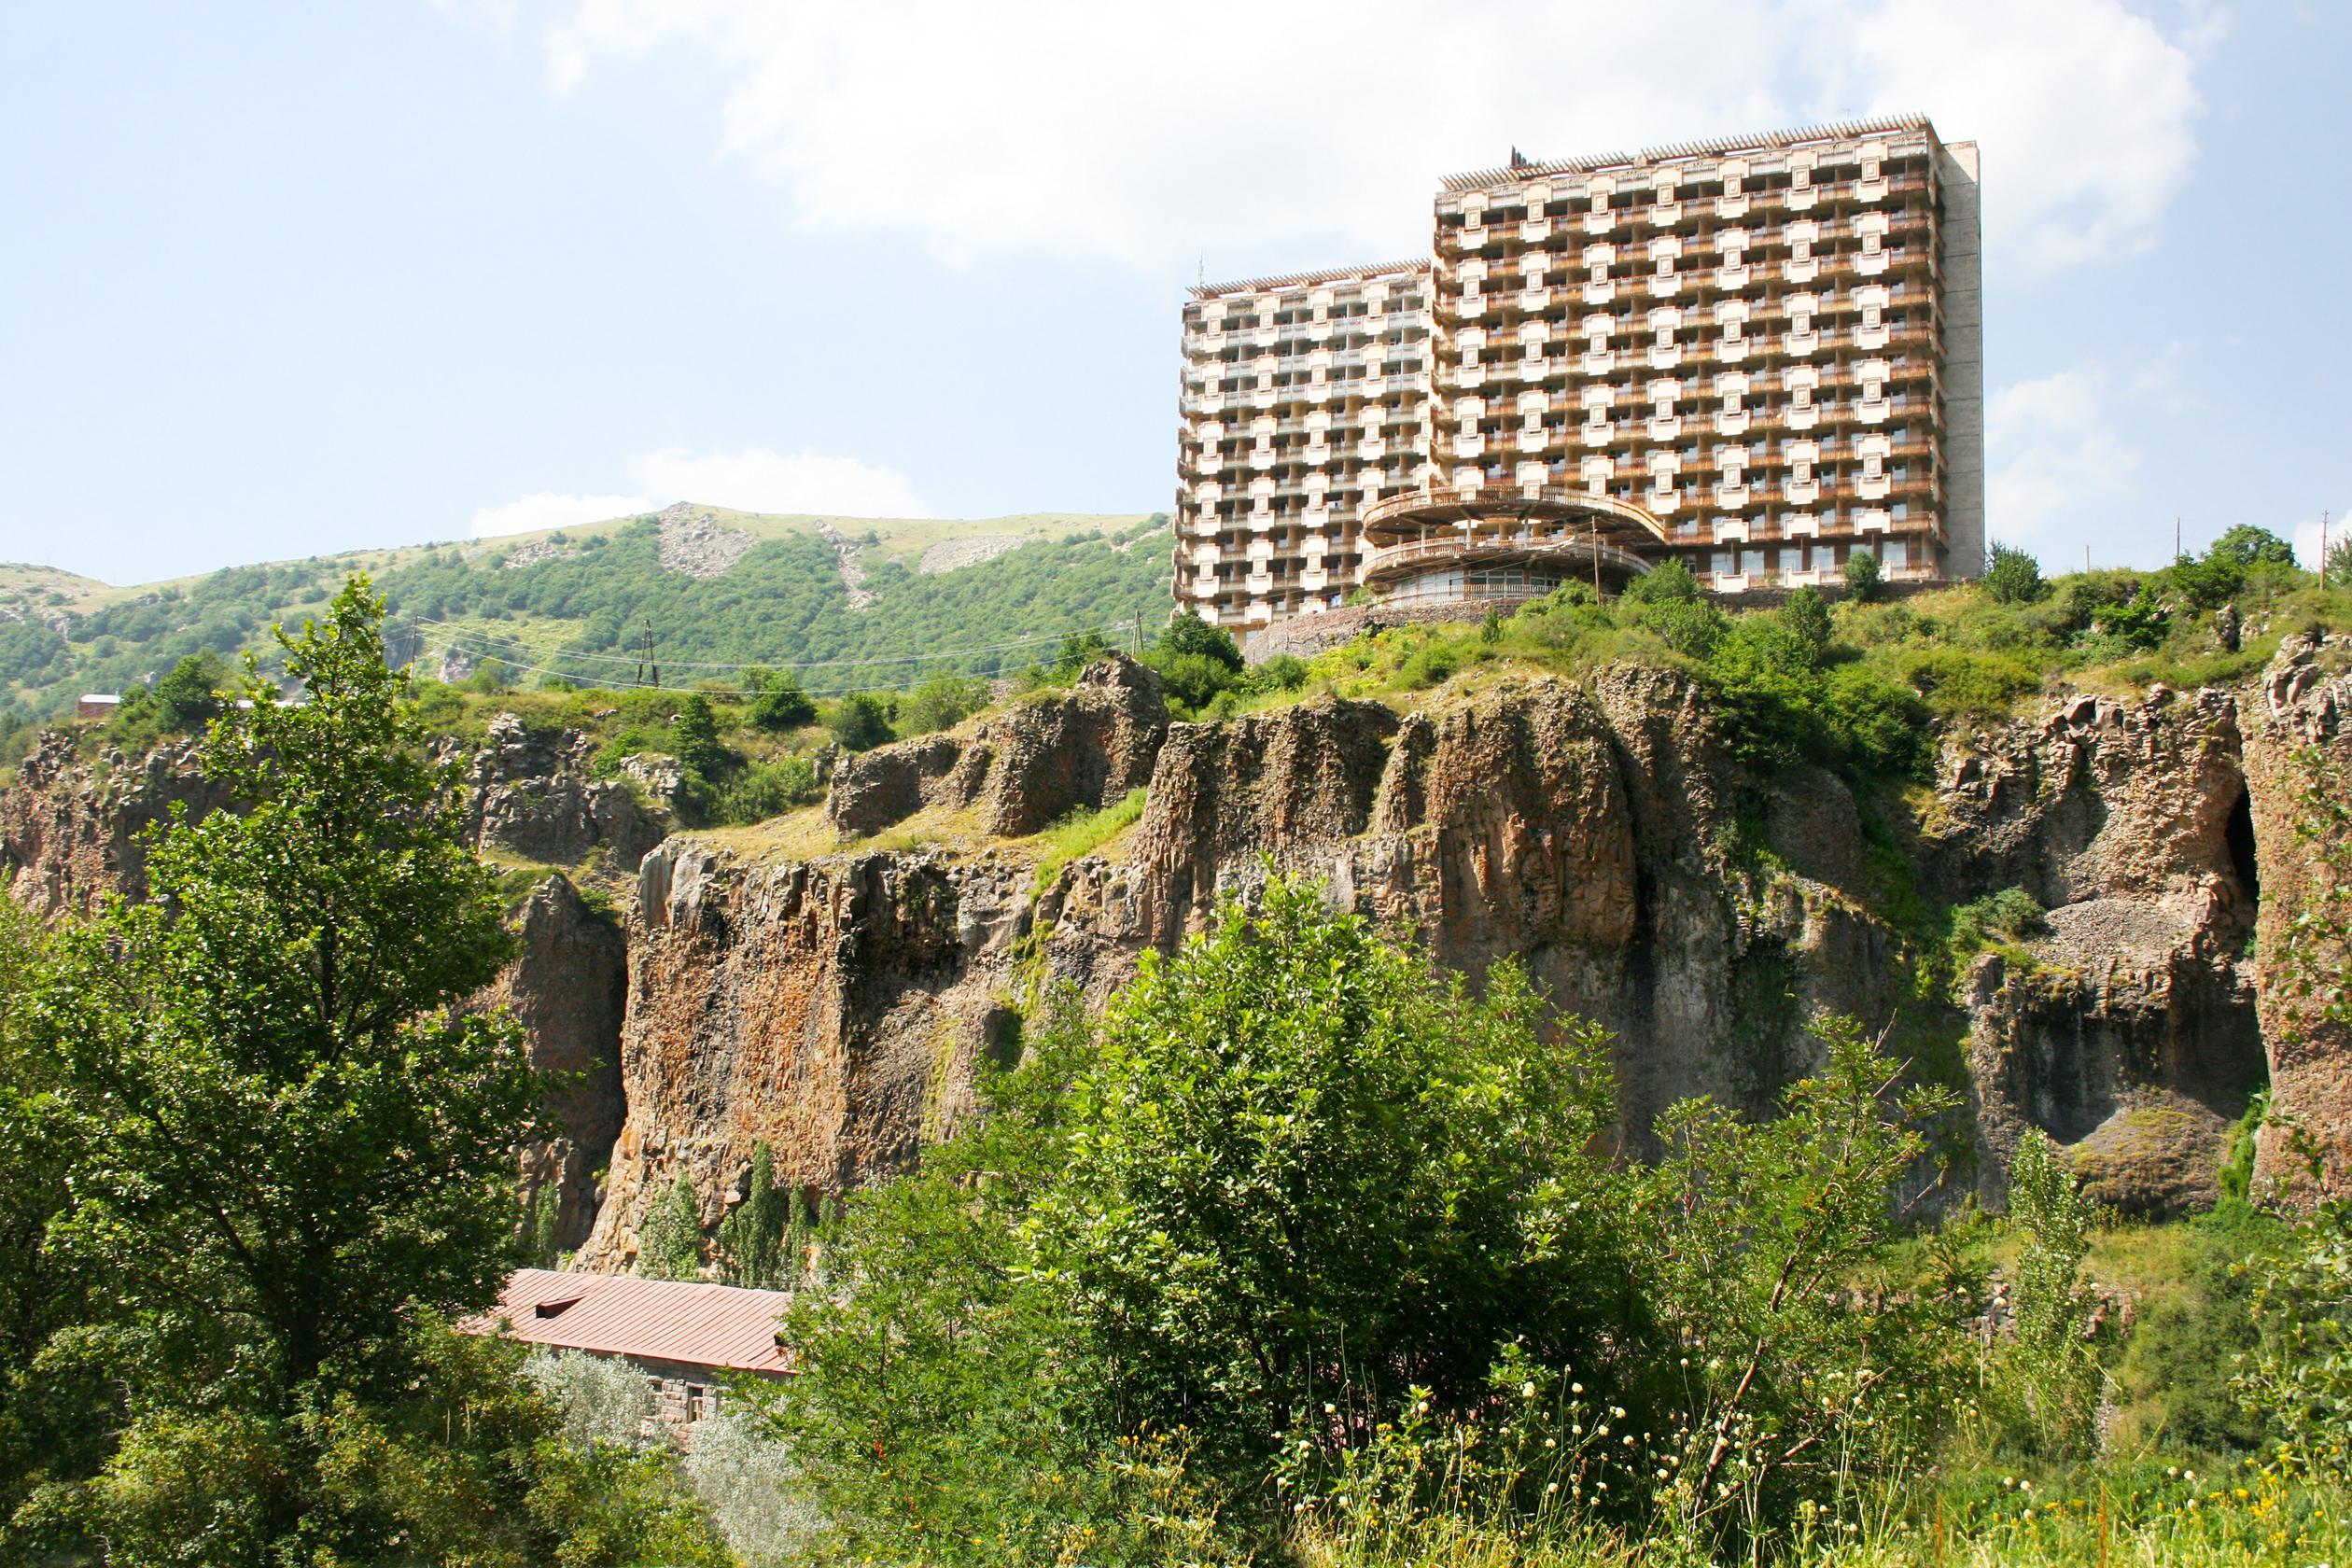 Cliffside hotel, Jermuk